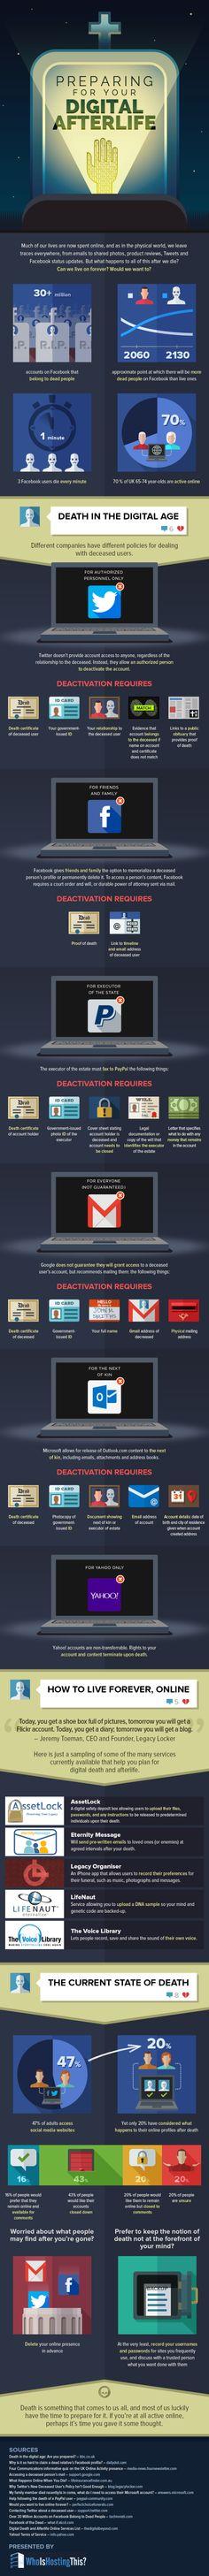 Preparing for your digital afterlife #infografia #infographic #socialmedia